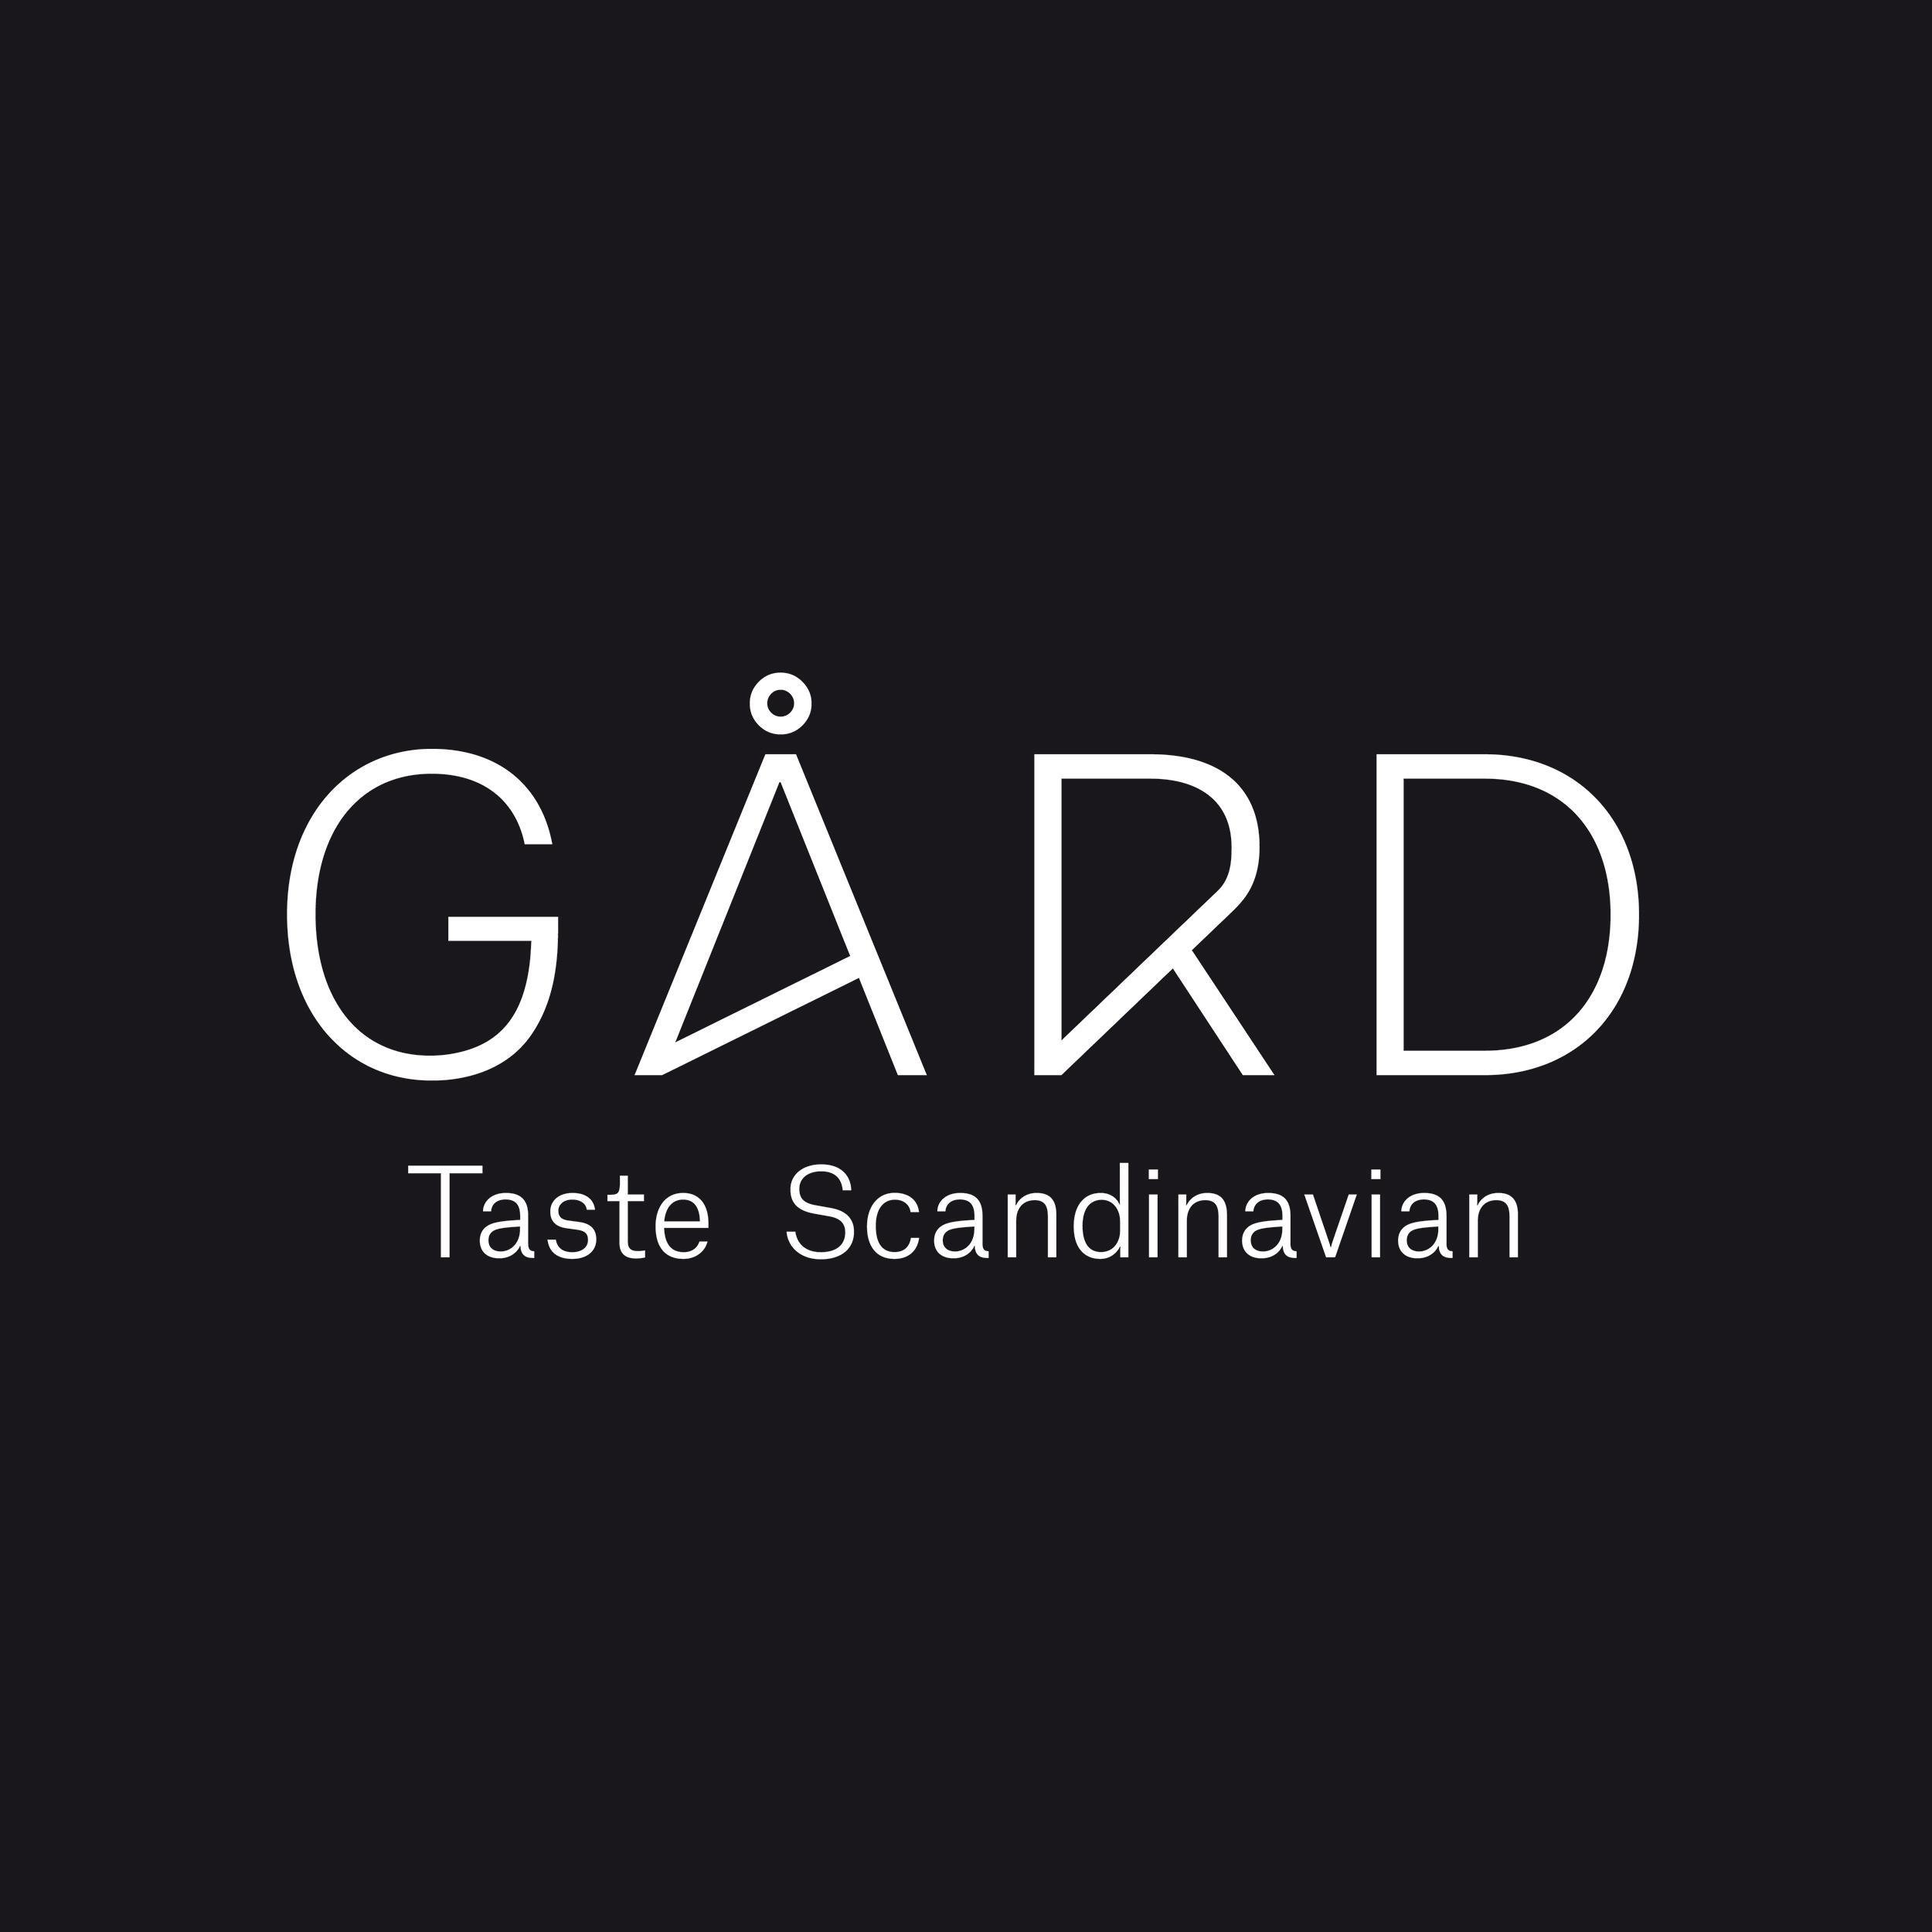 GÅRD Taste Scandinavian Heathrow